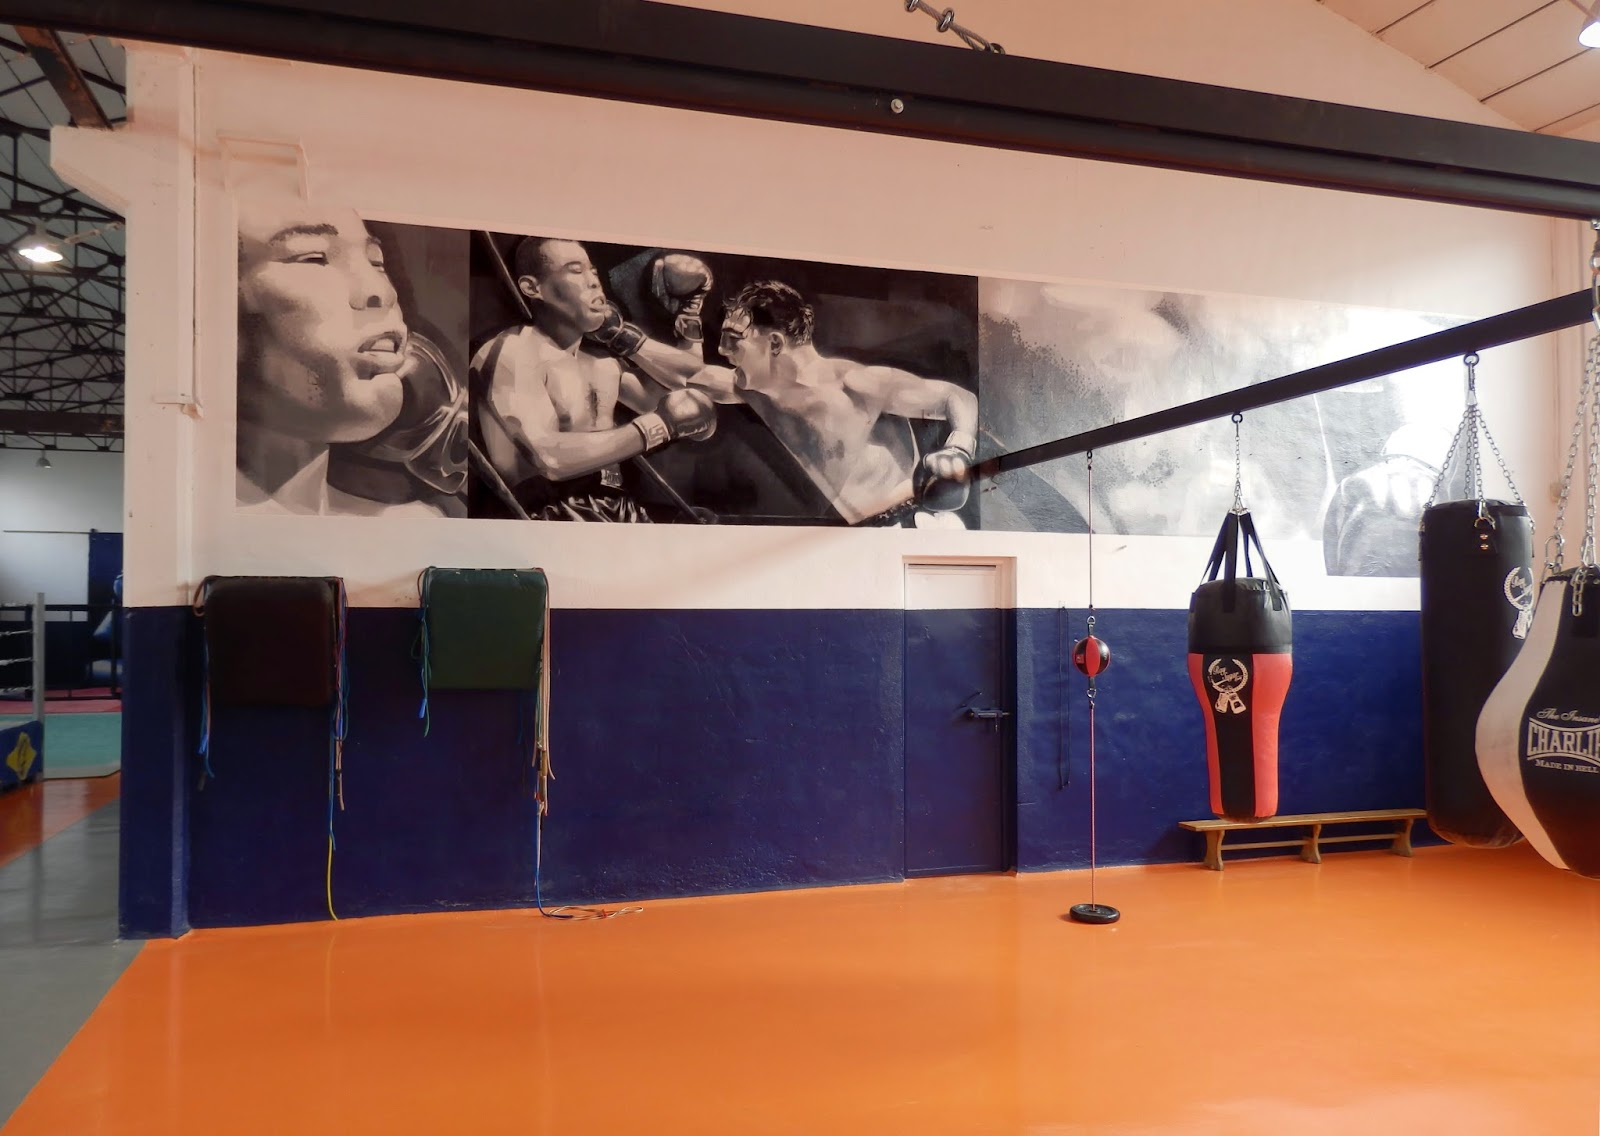 Gimnasio gasteiz sport fill in culture - Decoracion gimnasio ...